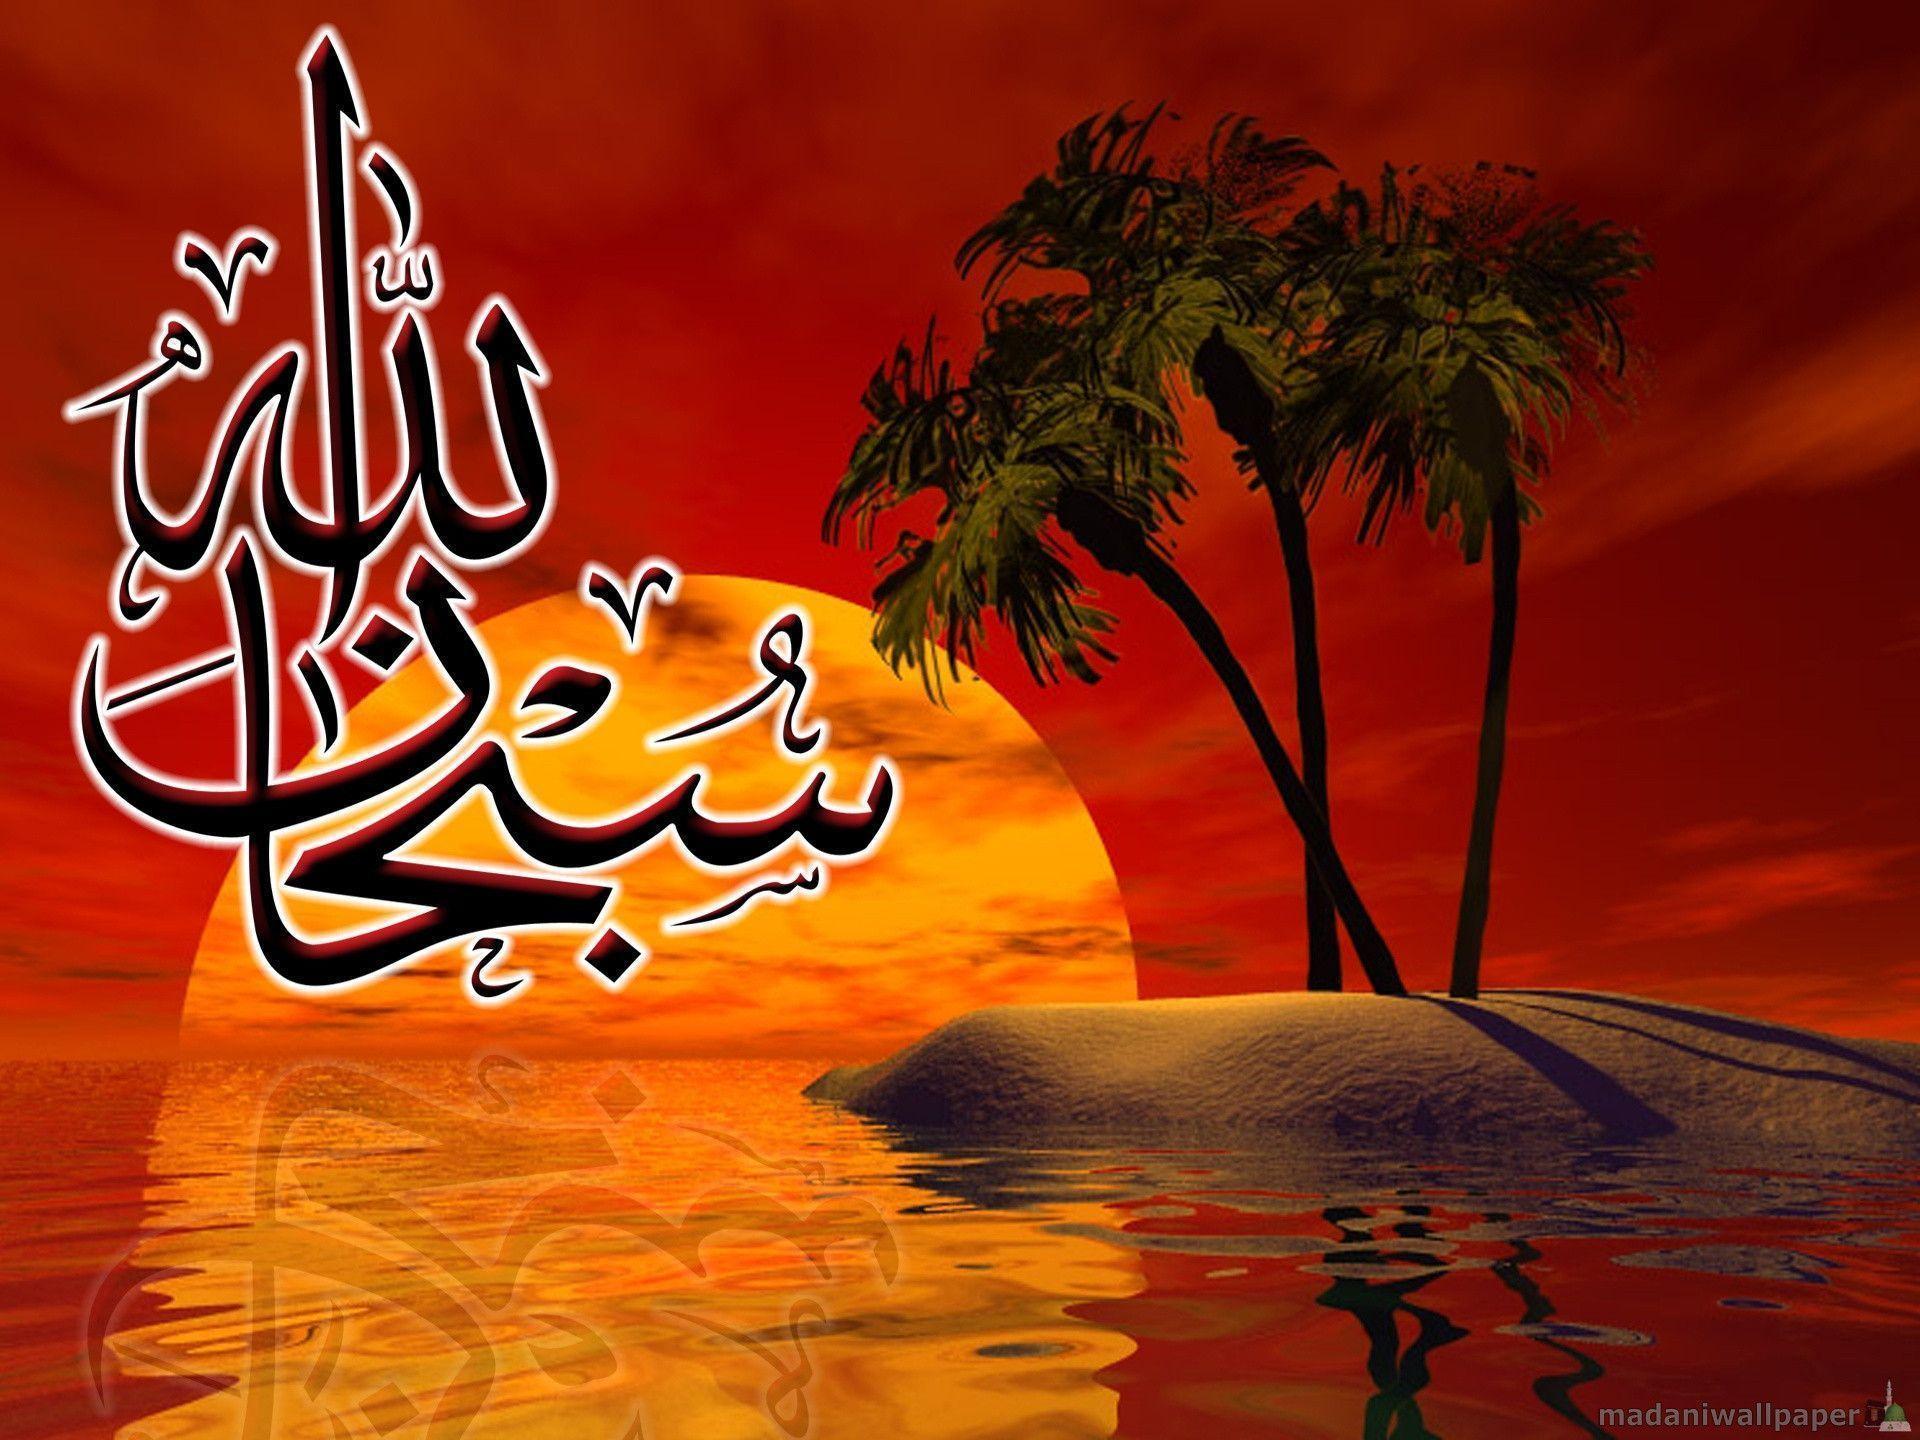 Allah-O-Akbar Wallpapers | Hd Wallpapers